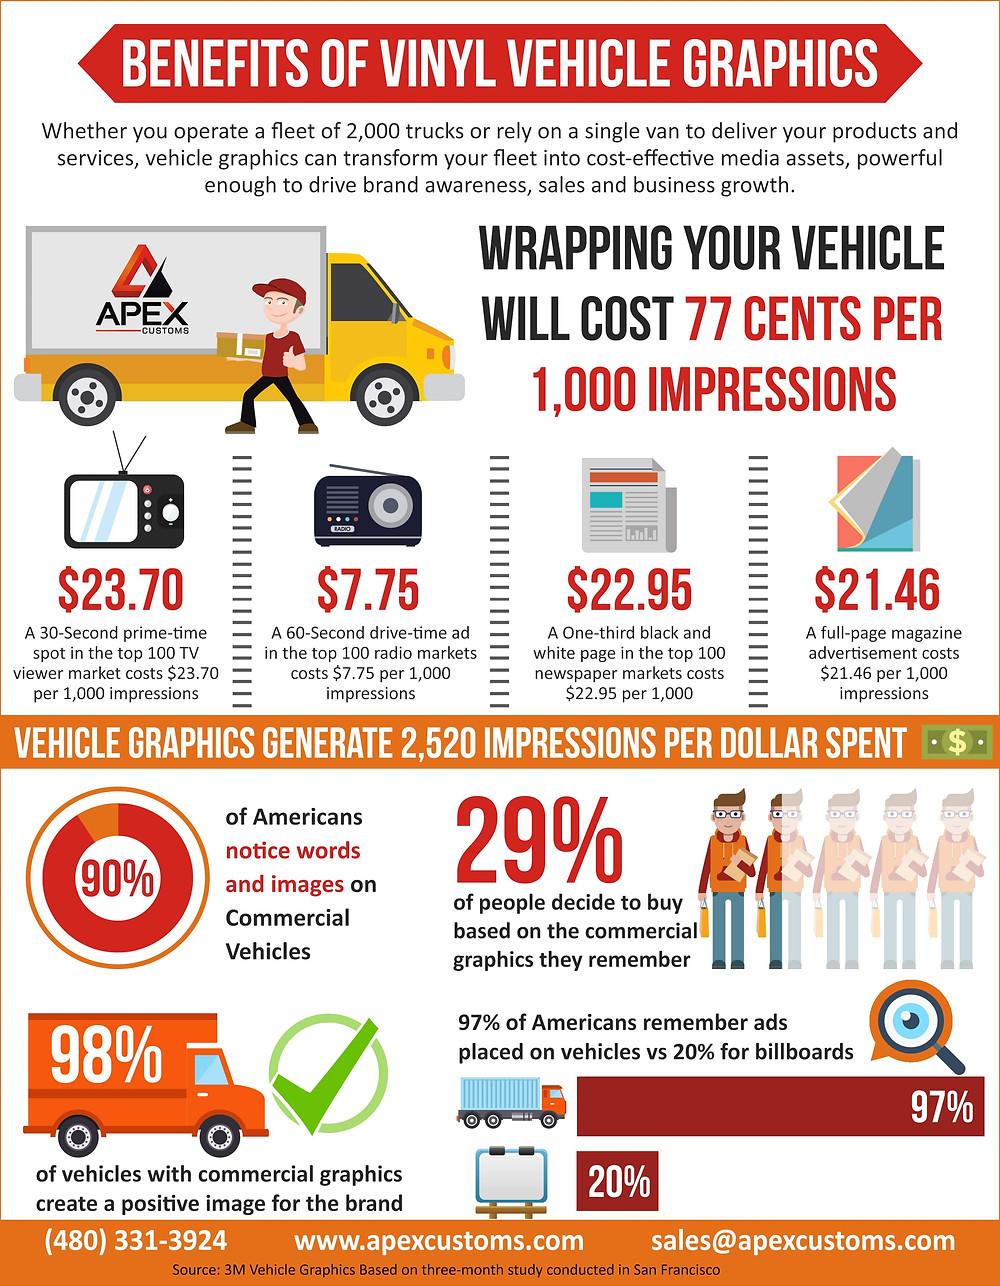 Benefits of Vehicle Vinyl Graphics Infographic